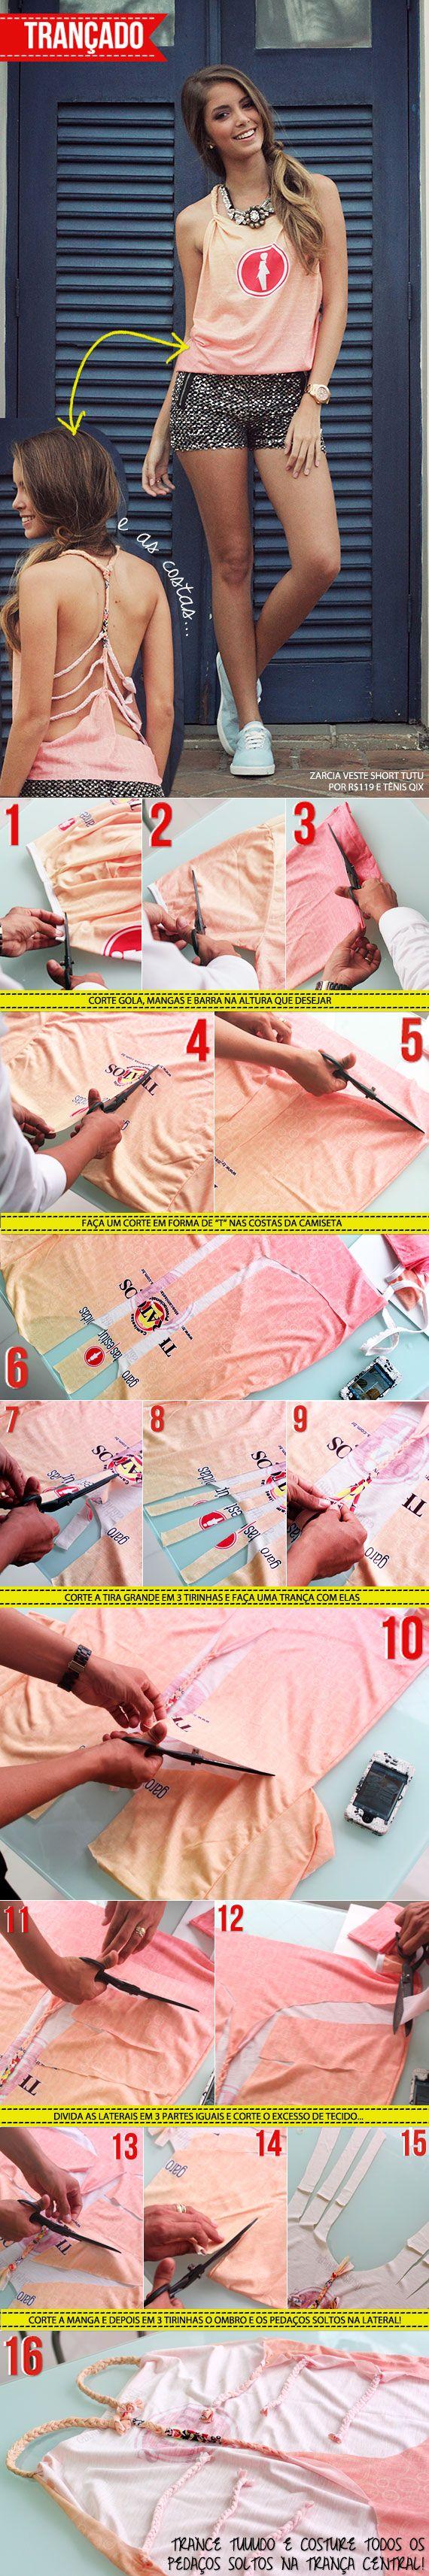 DIY: Customizar Blusa - Garotas Estúpidas.